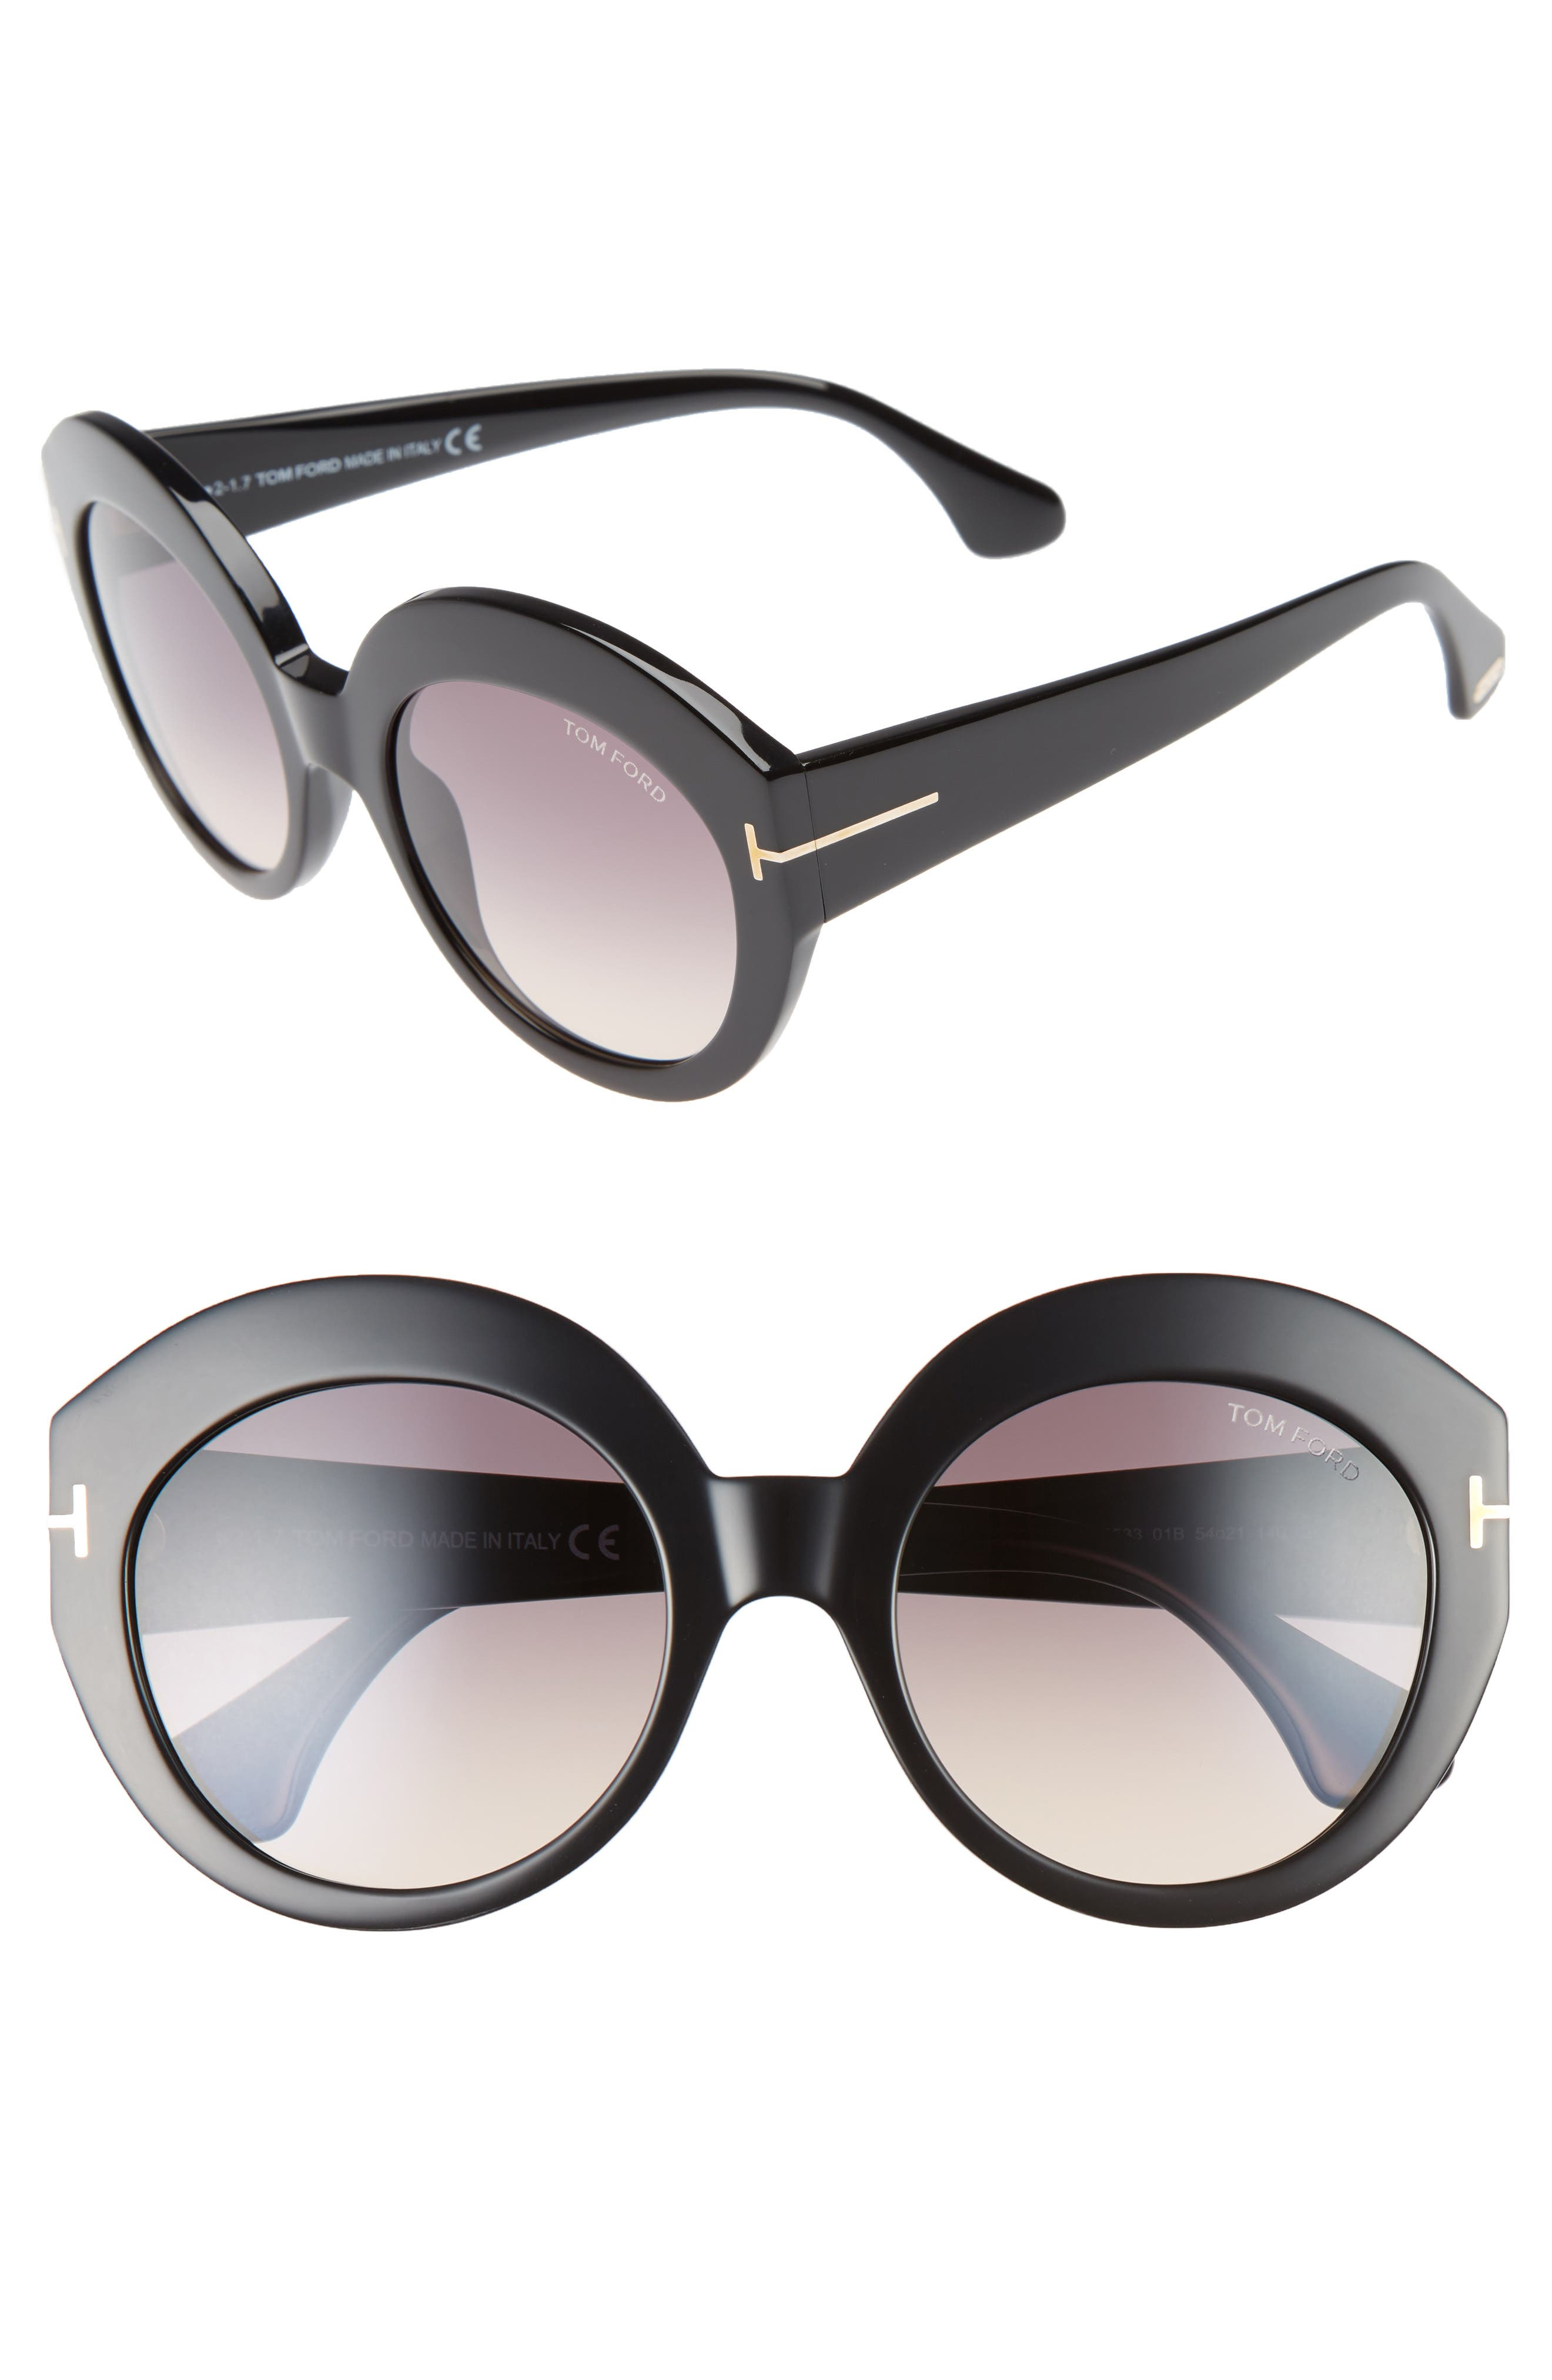 Rachel 54mm Gradient Lens Sunglasses,                             Main thumbnail 1, color,                             Shiny Black/ Gradient Smoke